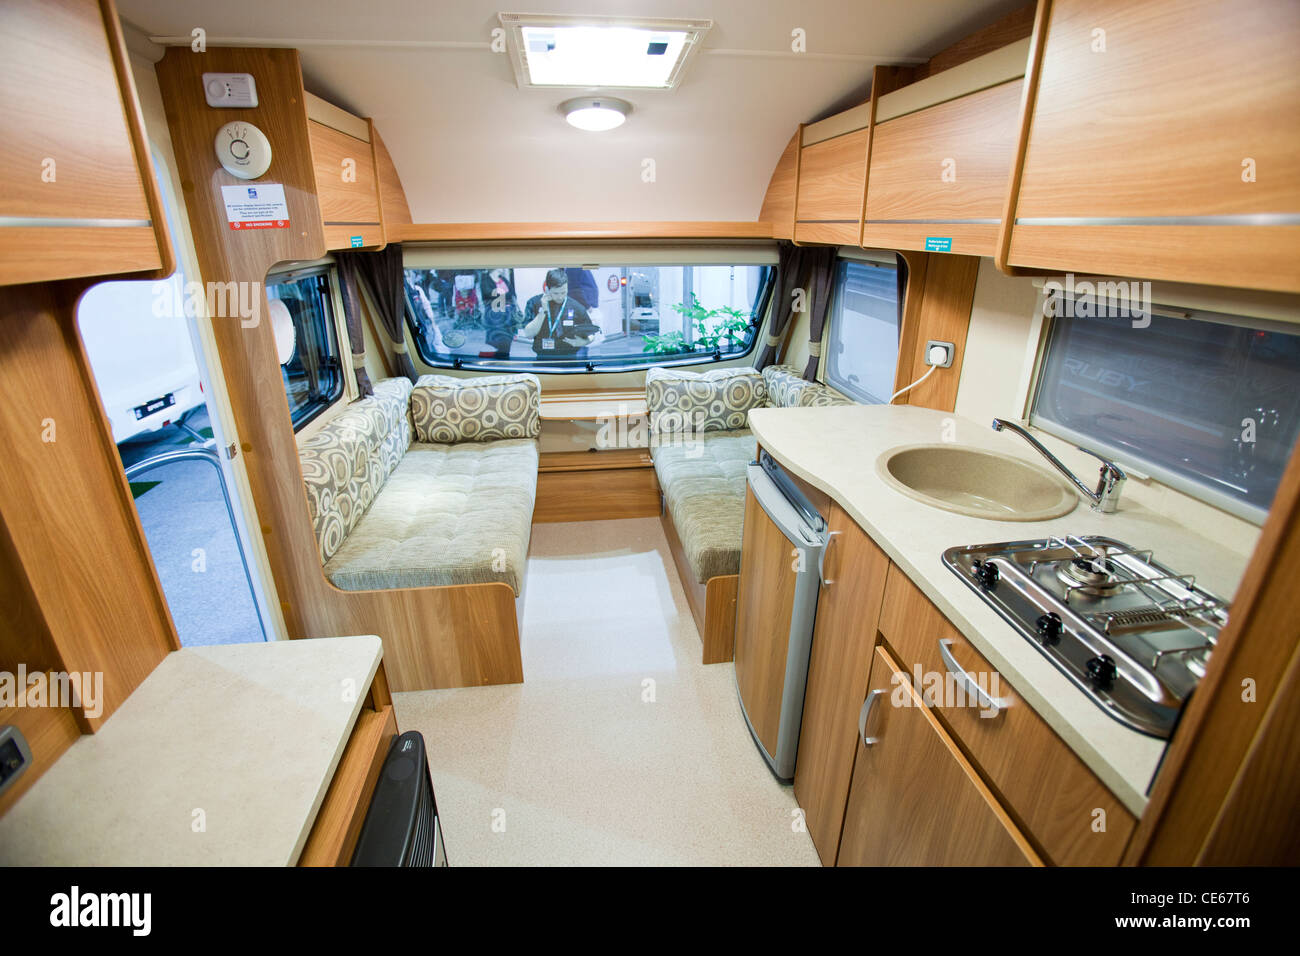 Caravan Interior Stockfotos & Caravan Interior Bilder - Alamy